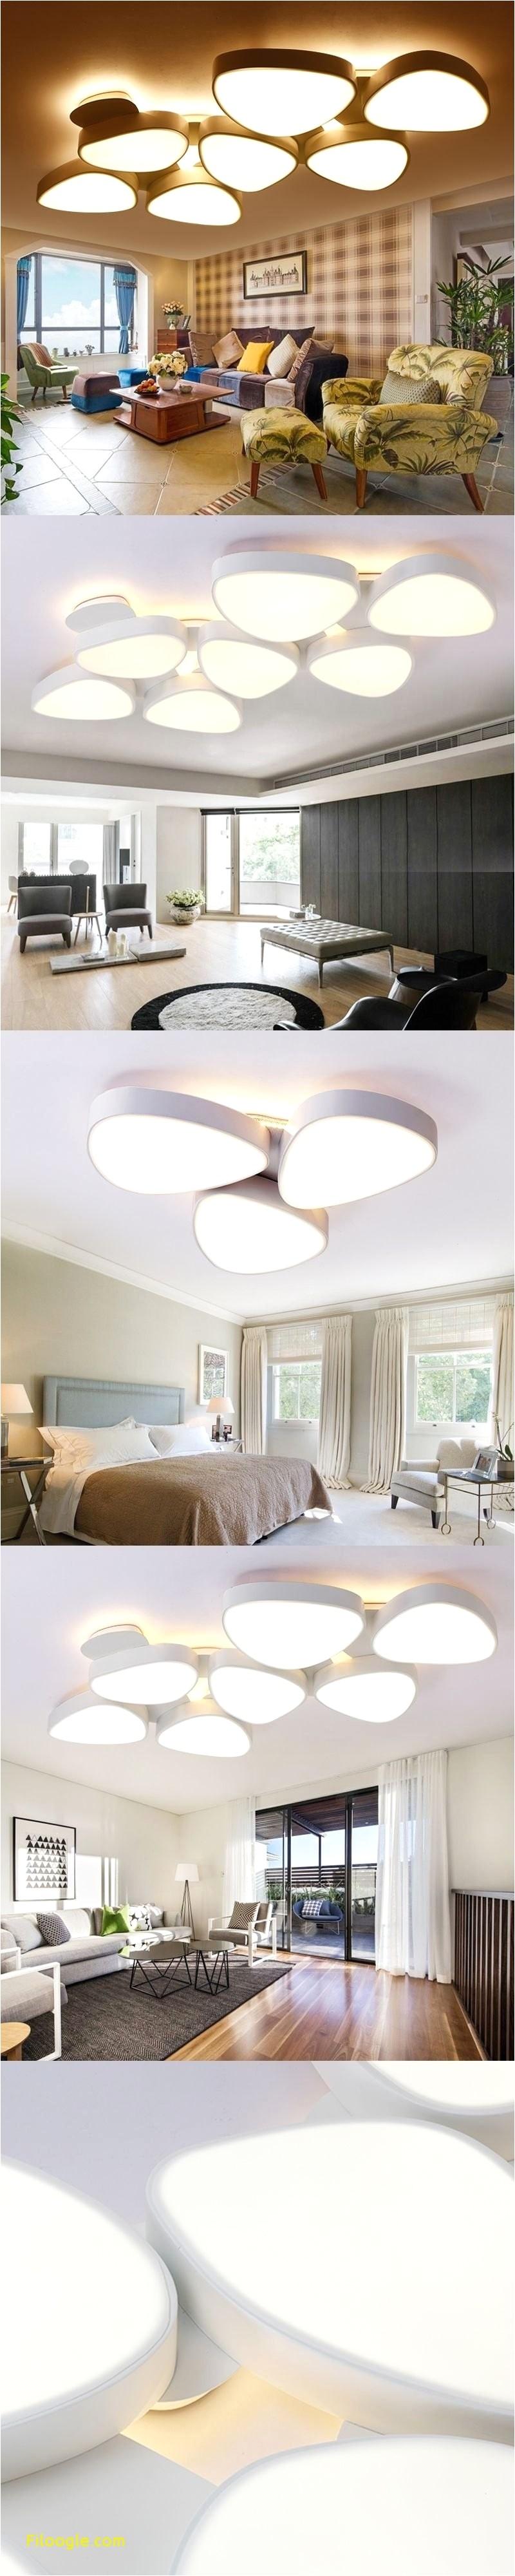 Best Interior Led Lights for Cars Home Interior Best Of Led Lights for Home Interior New Lamps Lamp